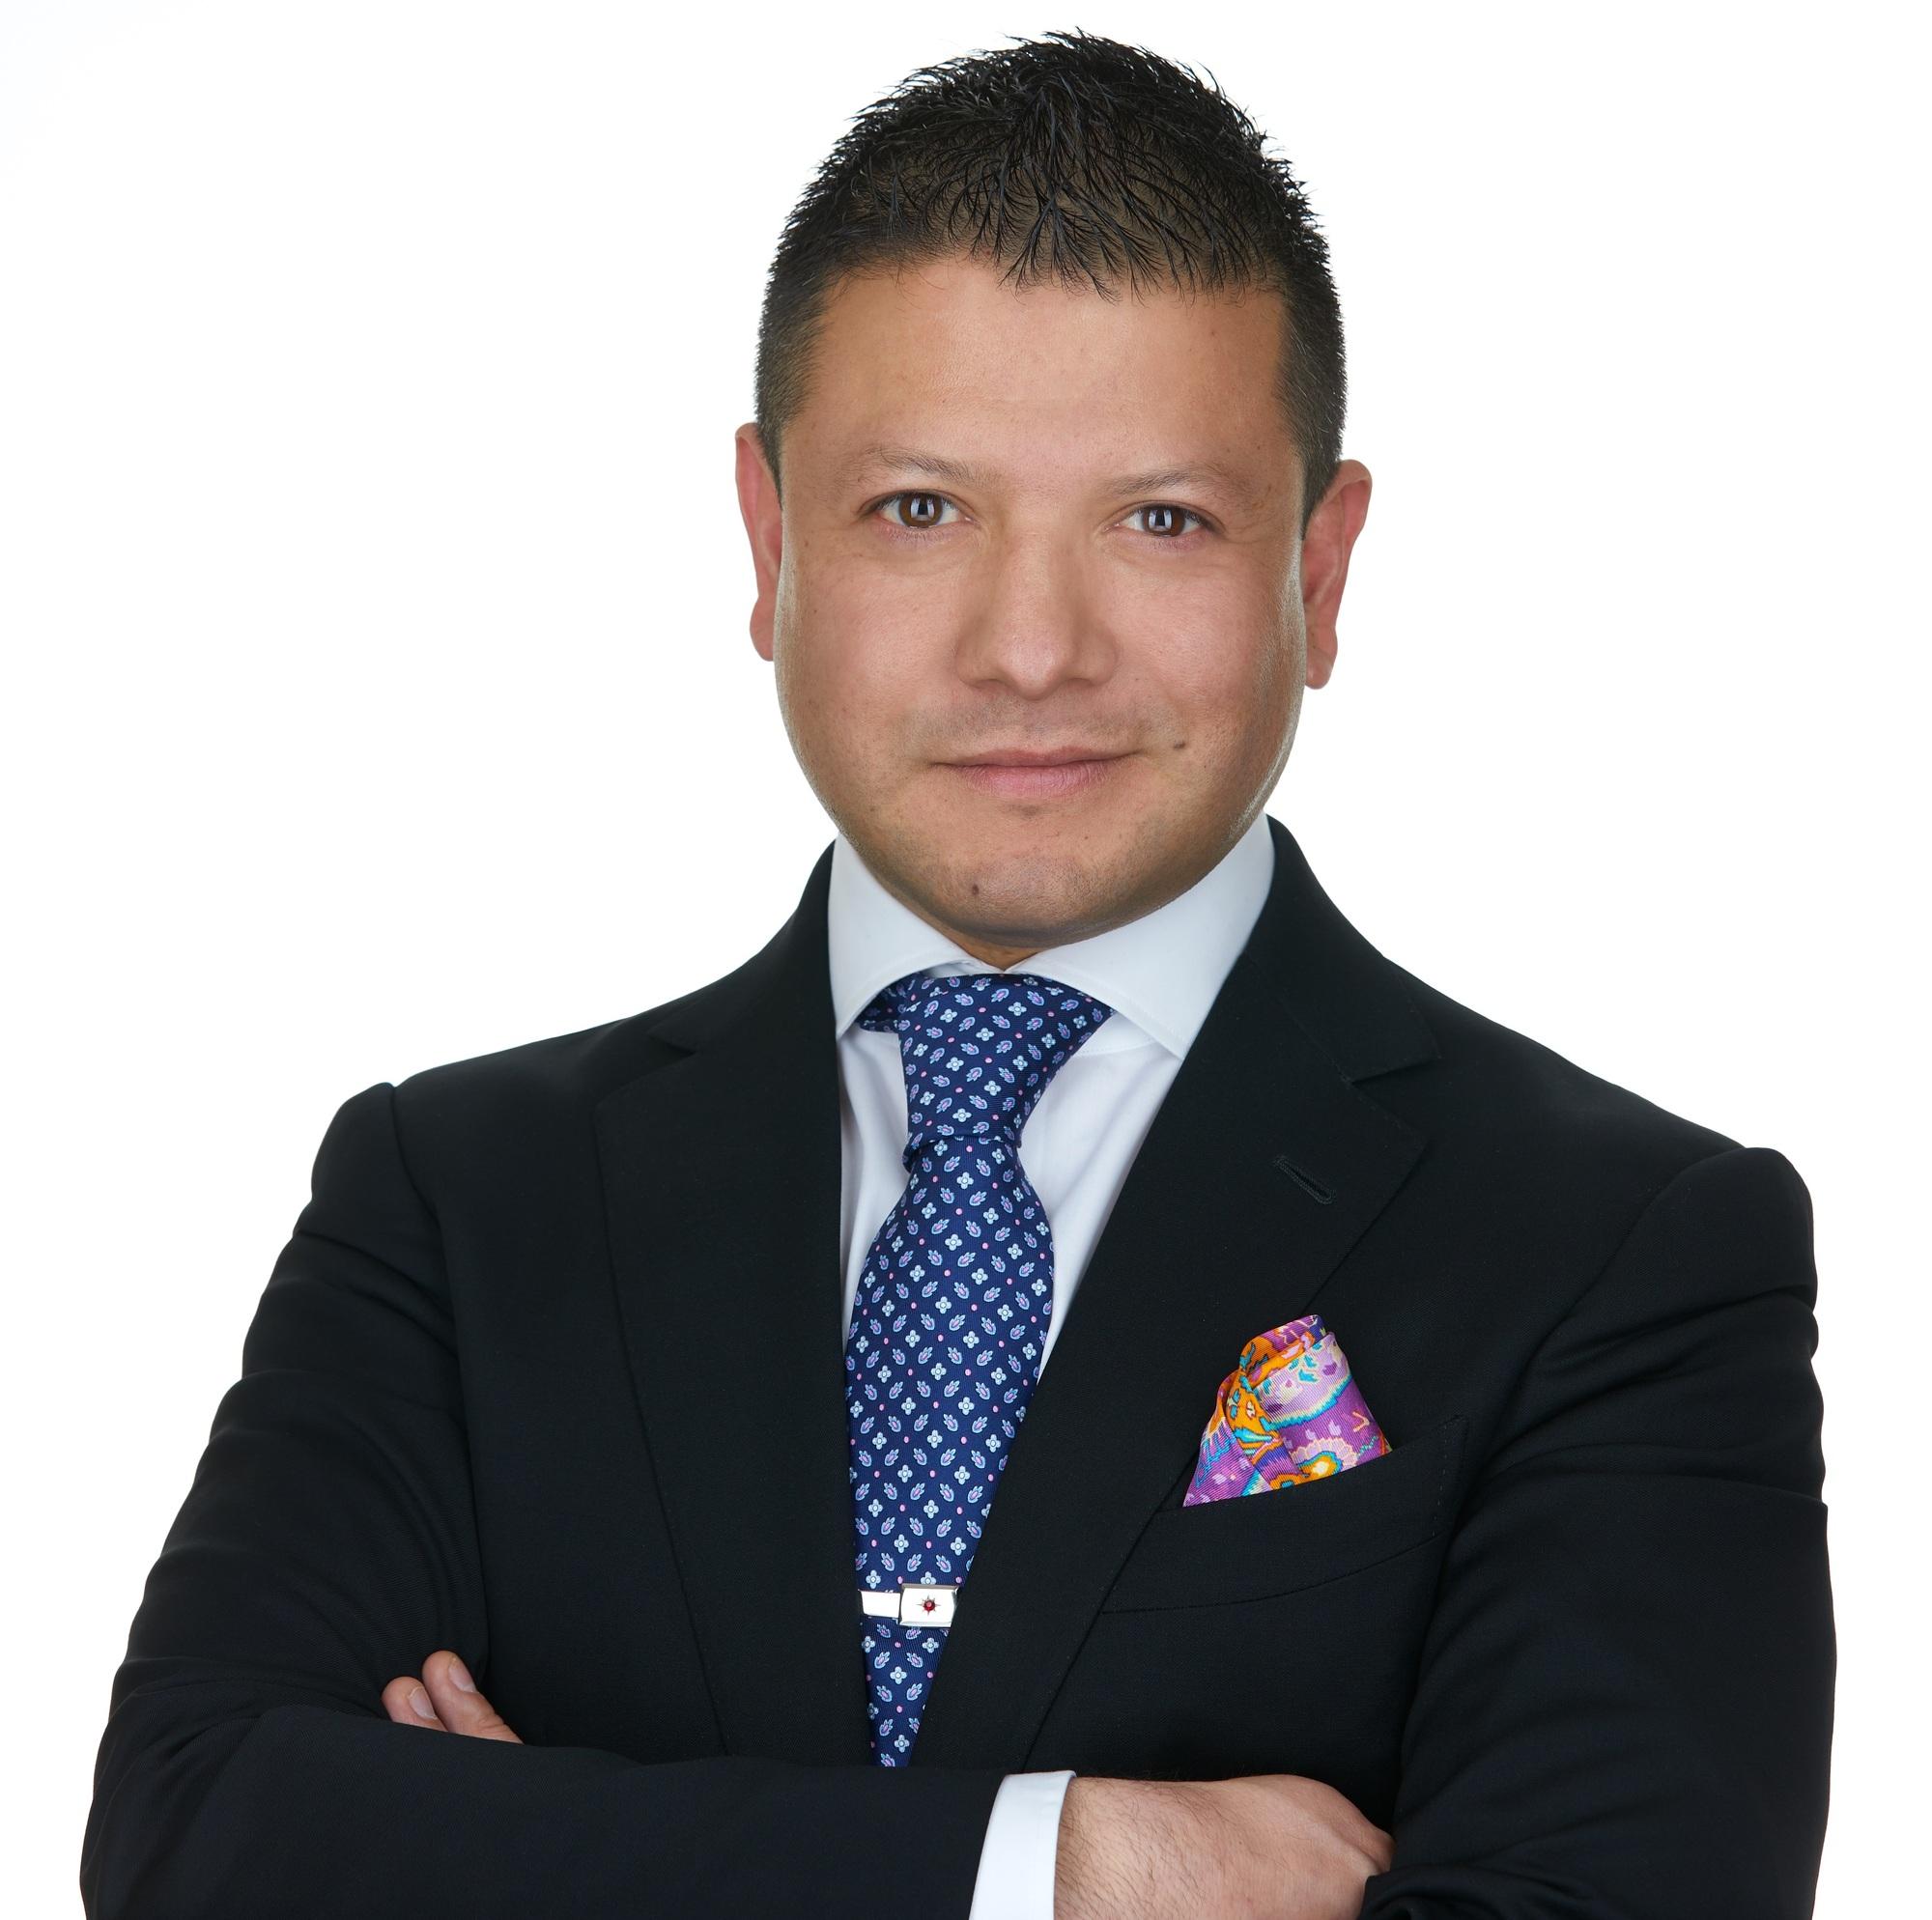 TD Bank Private Banking - Mauricio Vizconde - Edmonton, AB T5J 2Z1 - (780)448-8575 | ShowMeLocal.com